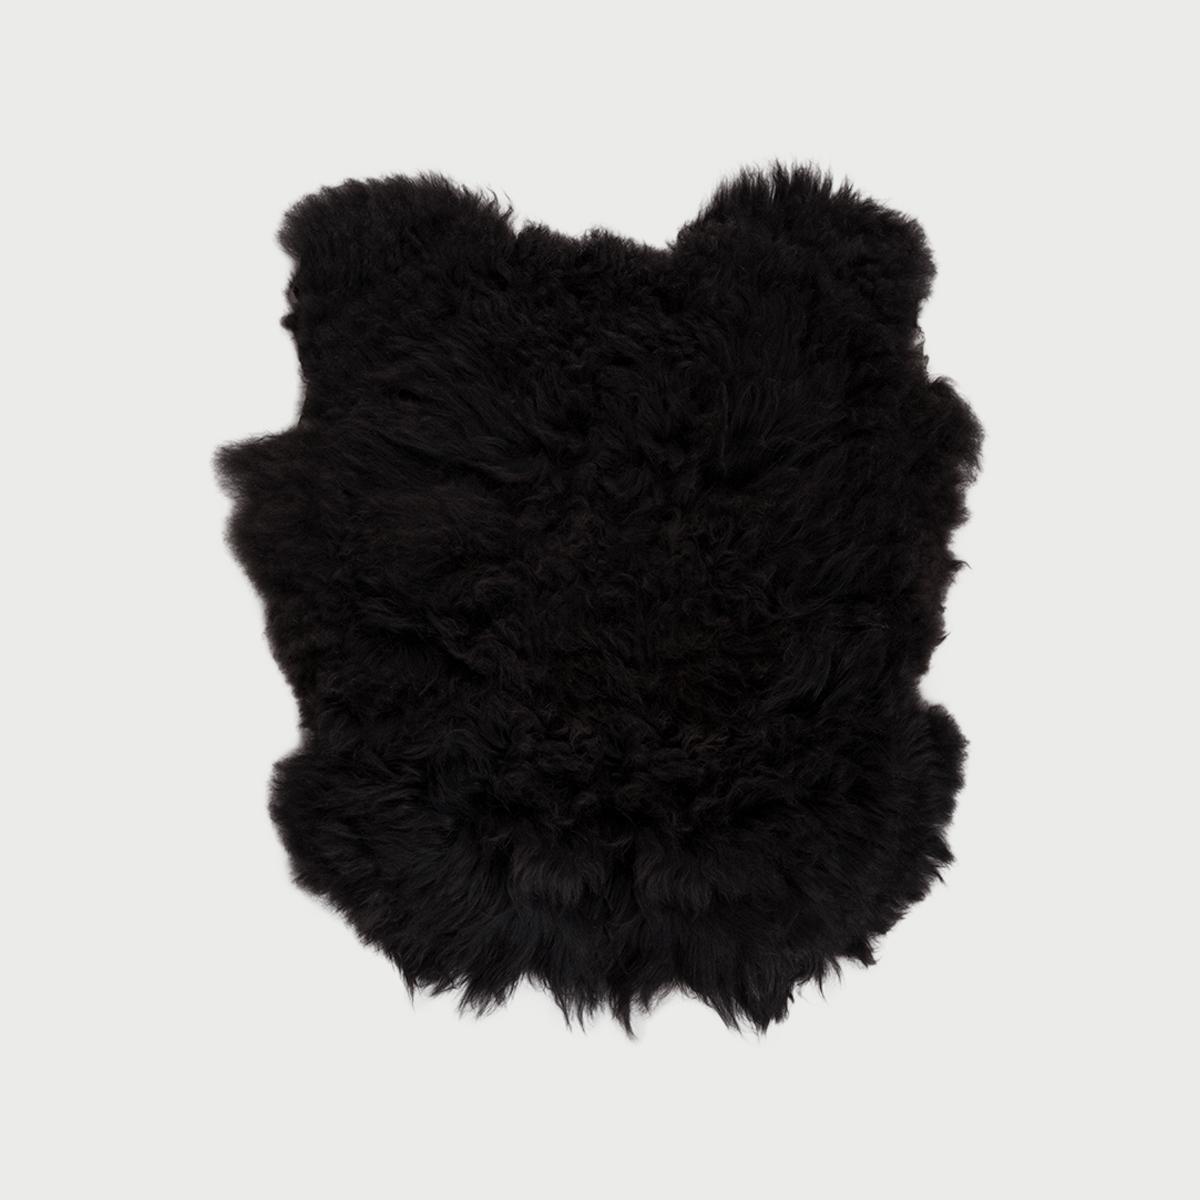 Sheepskin blackweb 2048x2048